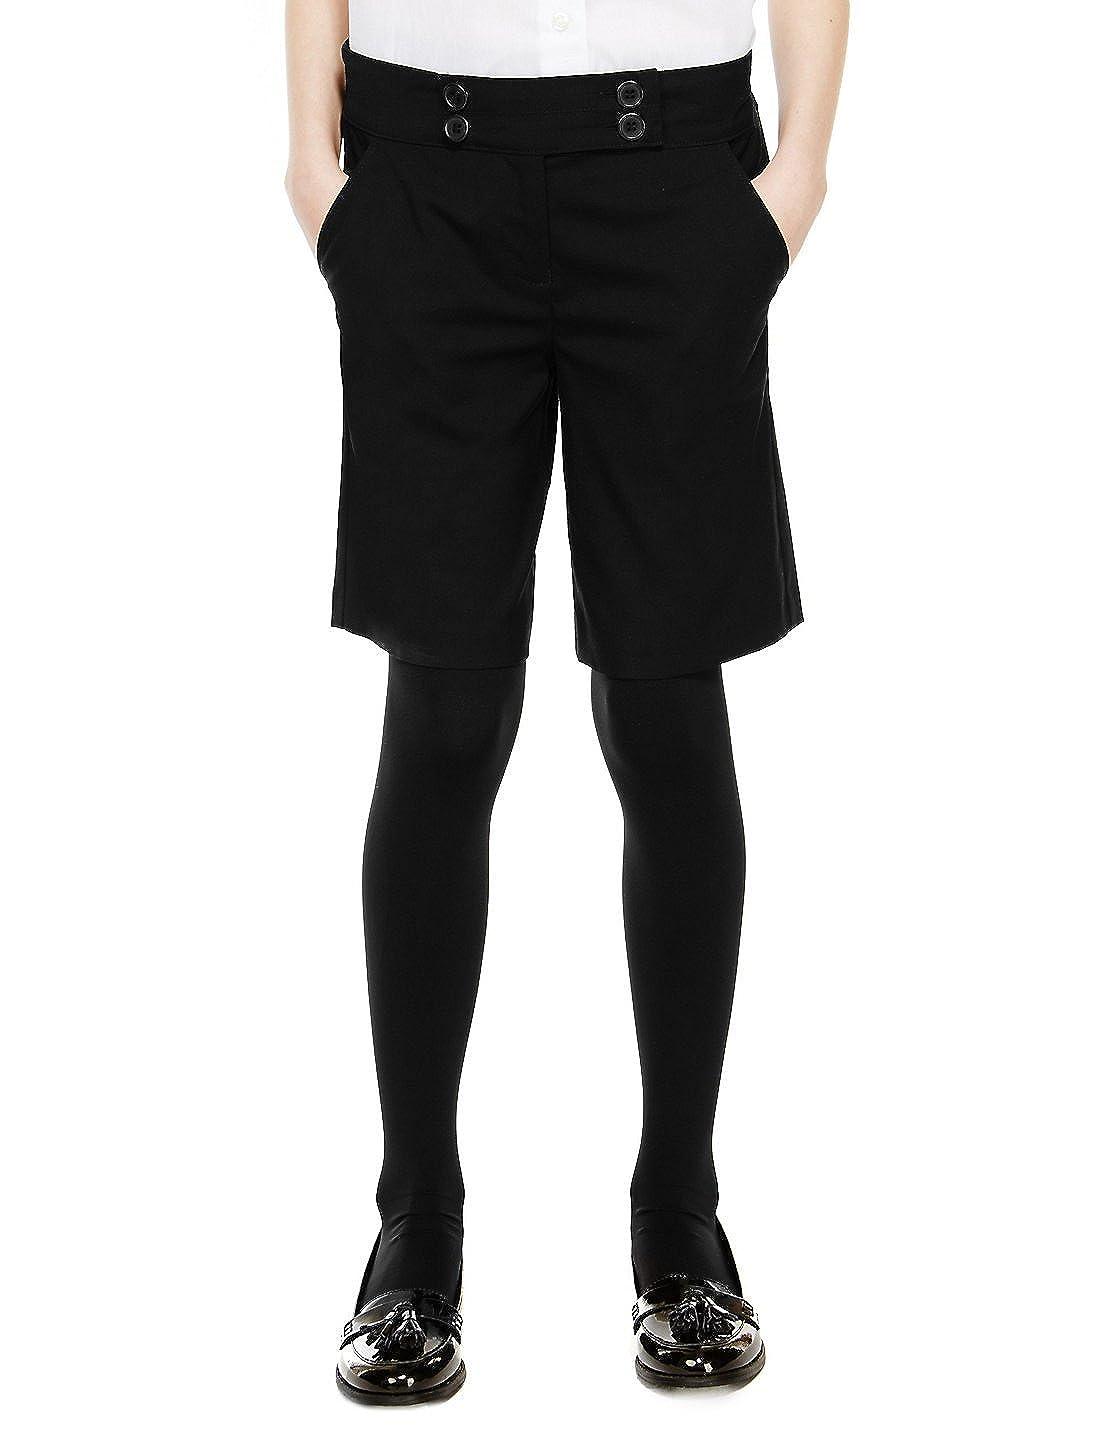 CC Girls School Shorts